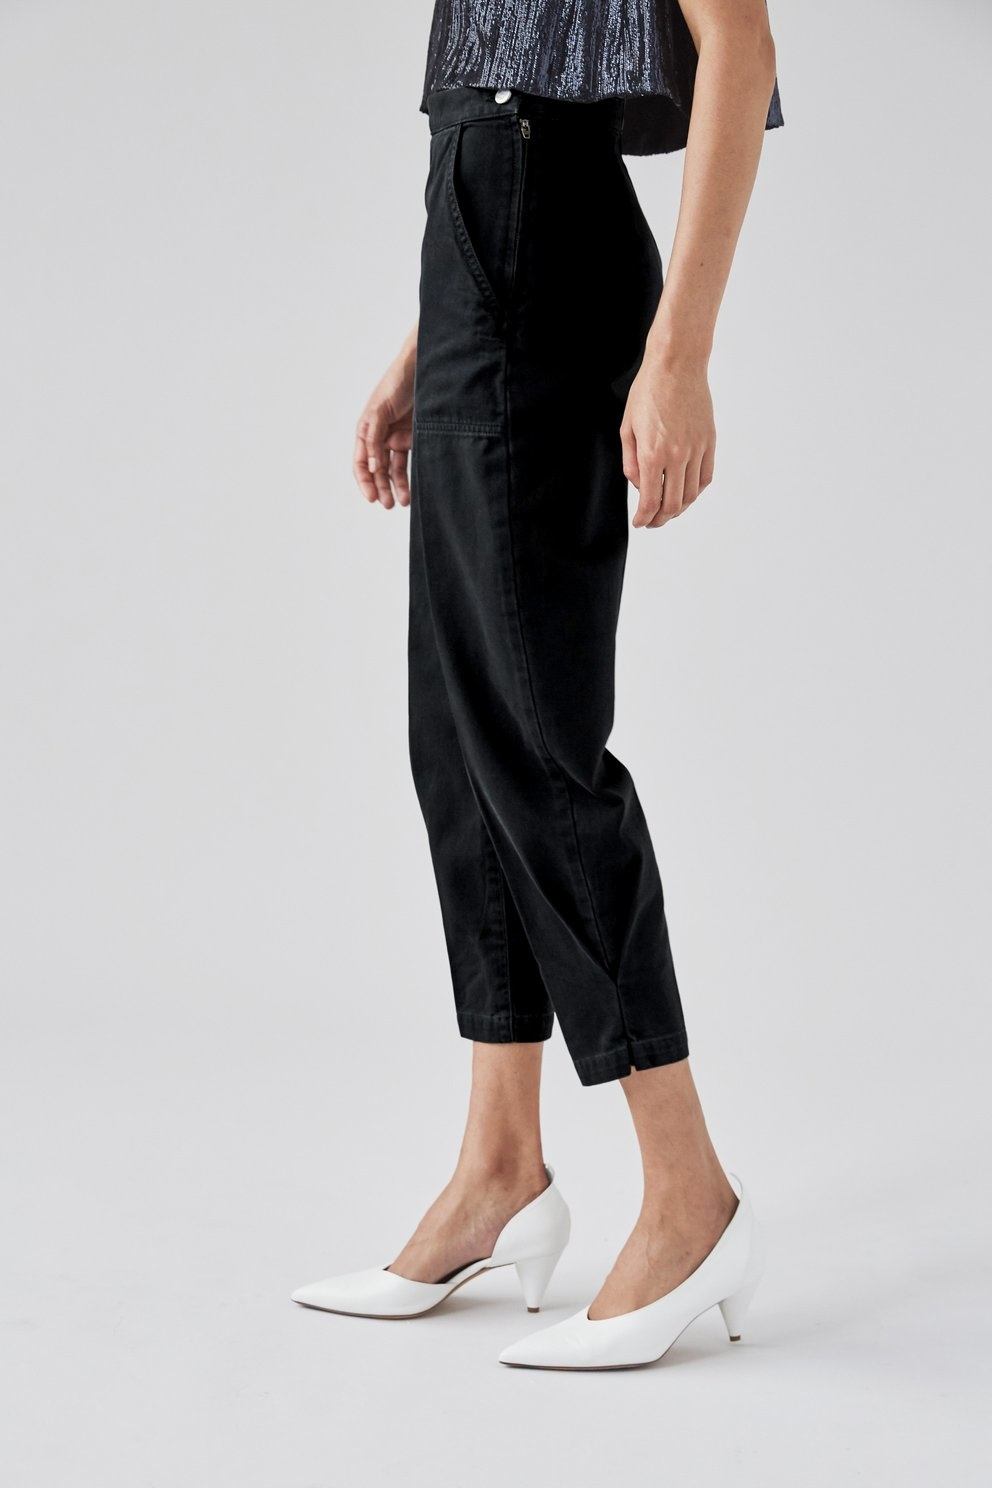 Transit Pant Black